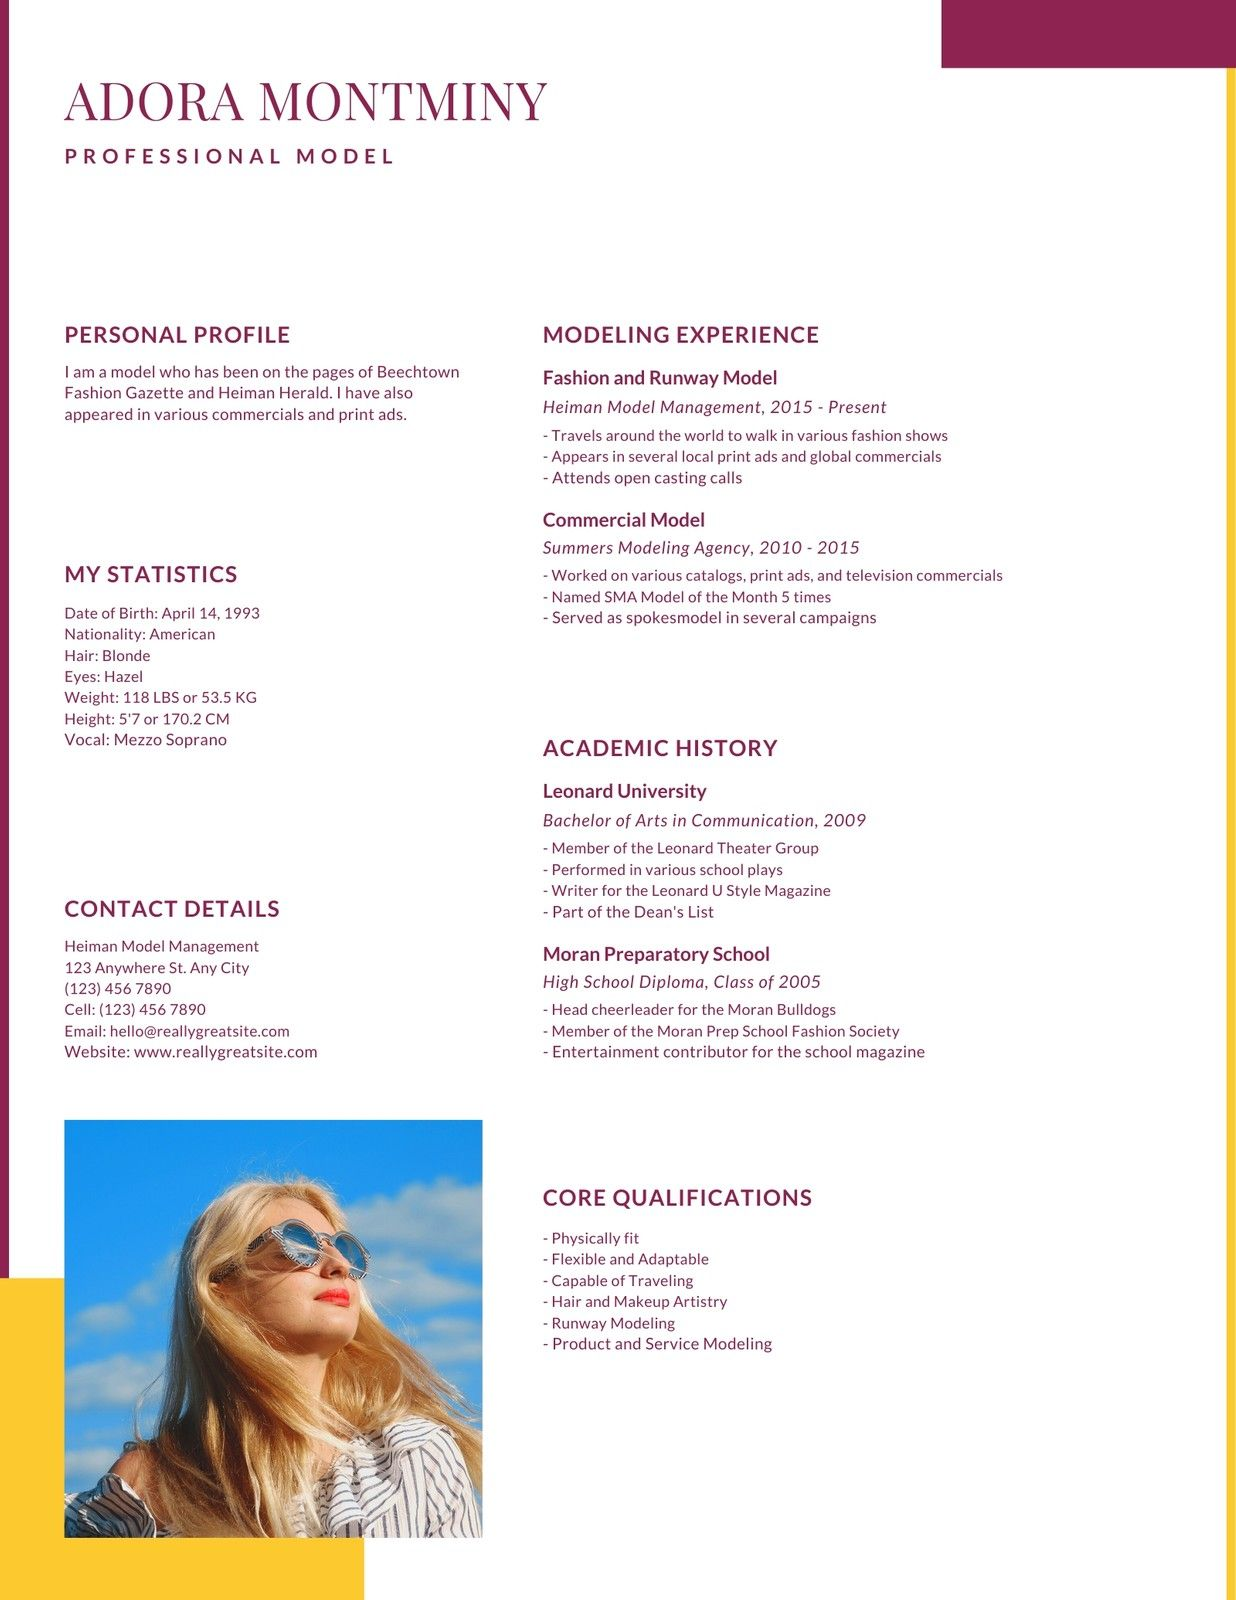 Yellow Magenta Fashion Photo Creative Resume Templates By Canva Ad Fashion Affiliate Photo Yellow M Print Ads Fashion Photo Travel Around The World